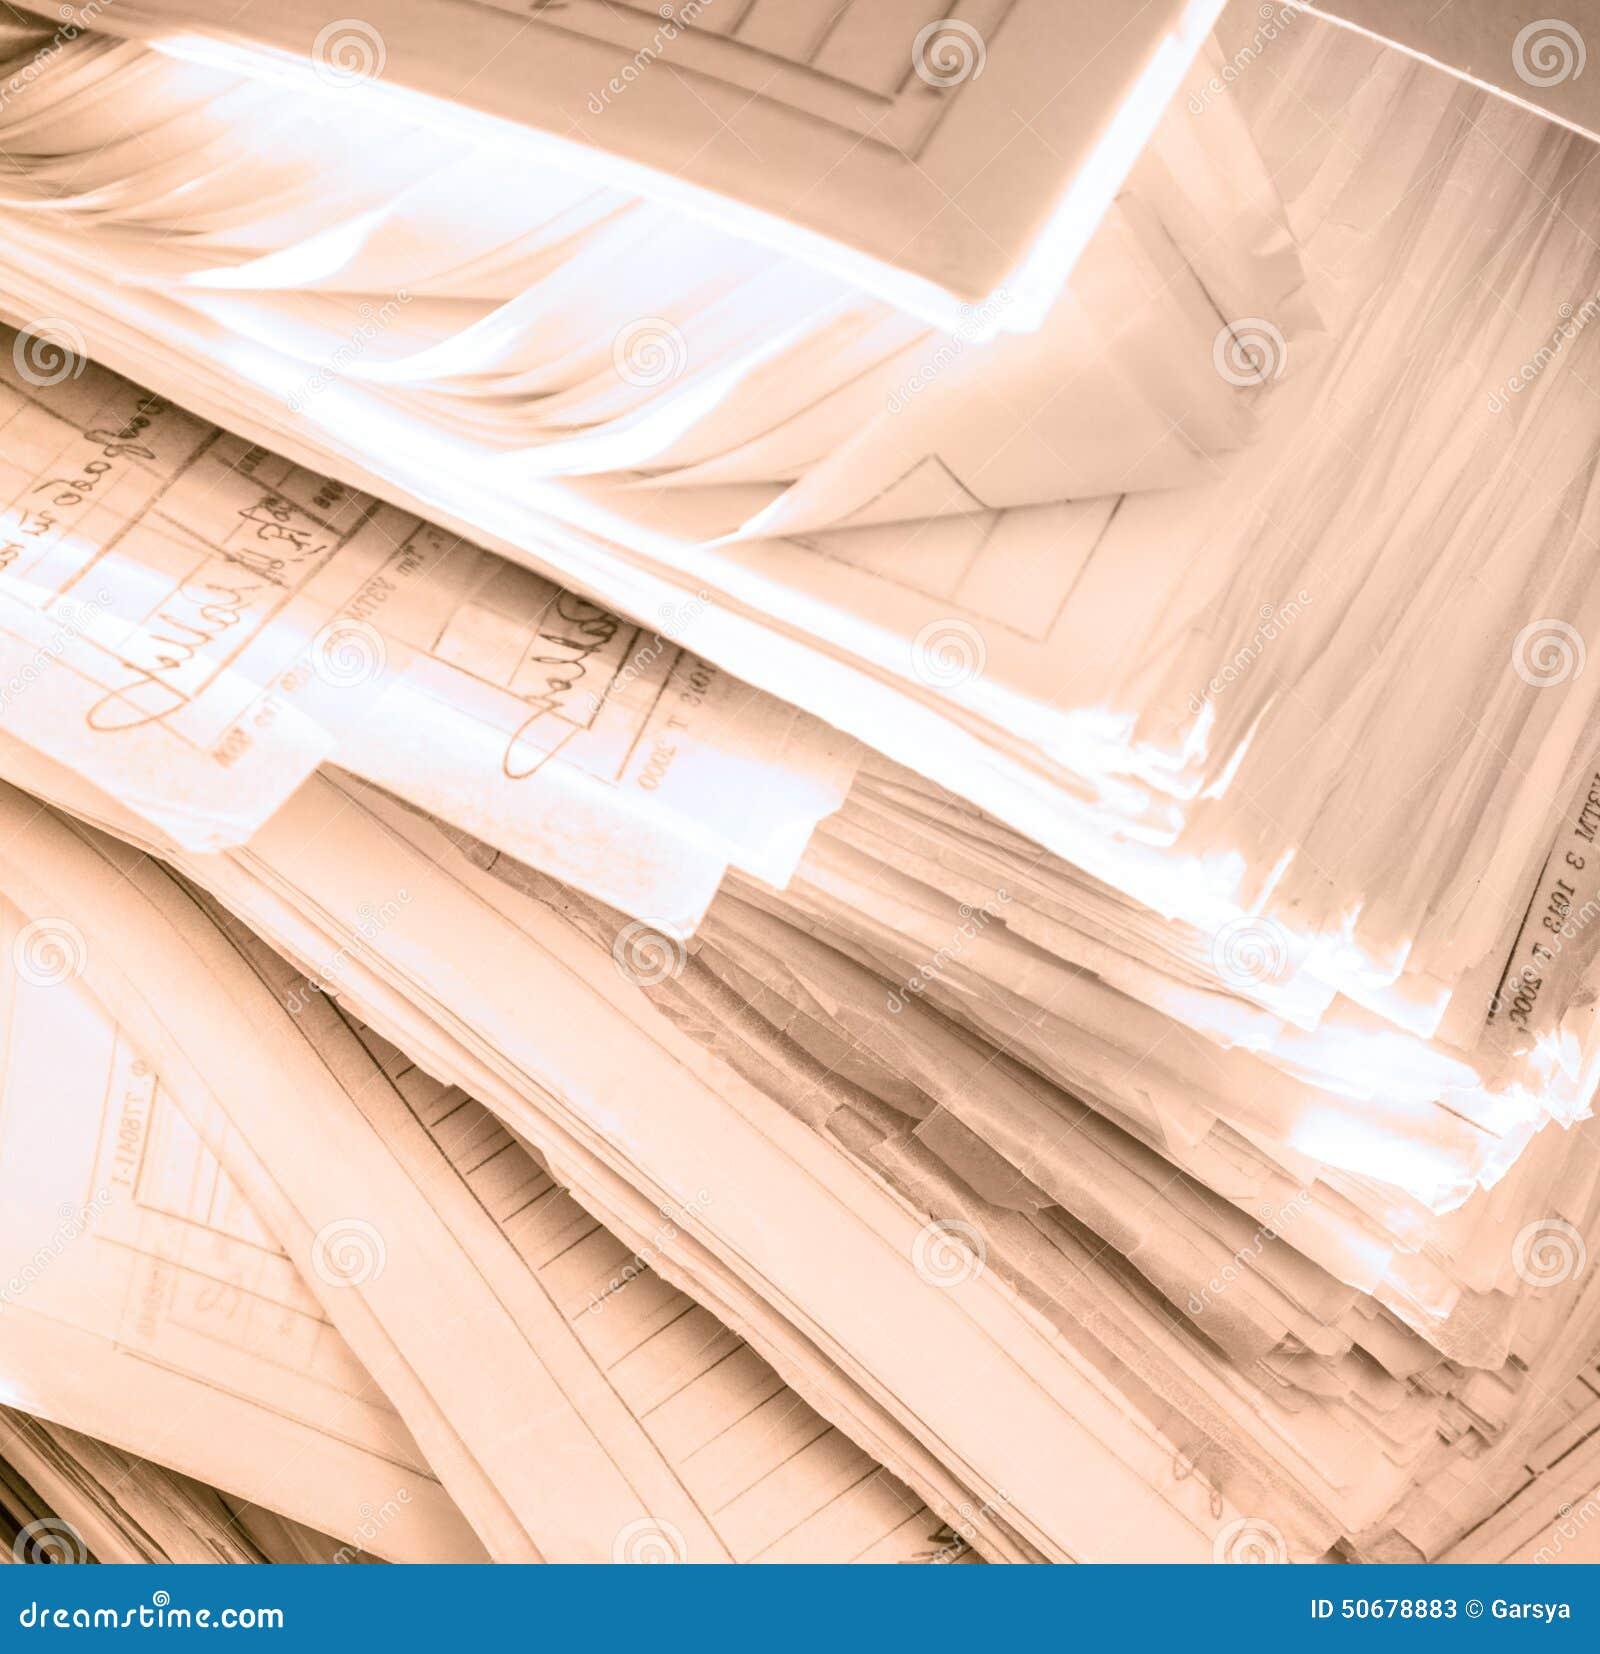 Download 肮脏的杂乱纸张文件 库存图片. 图片 包括有 寄存器, 图书馆, 商业, 特写镜头, 数据, 杂乱, 文件夹 - 50678883